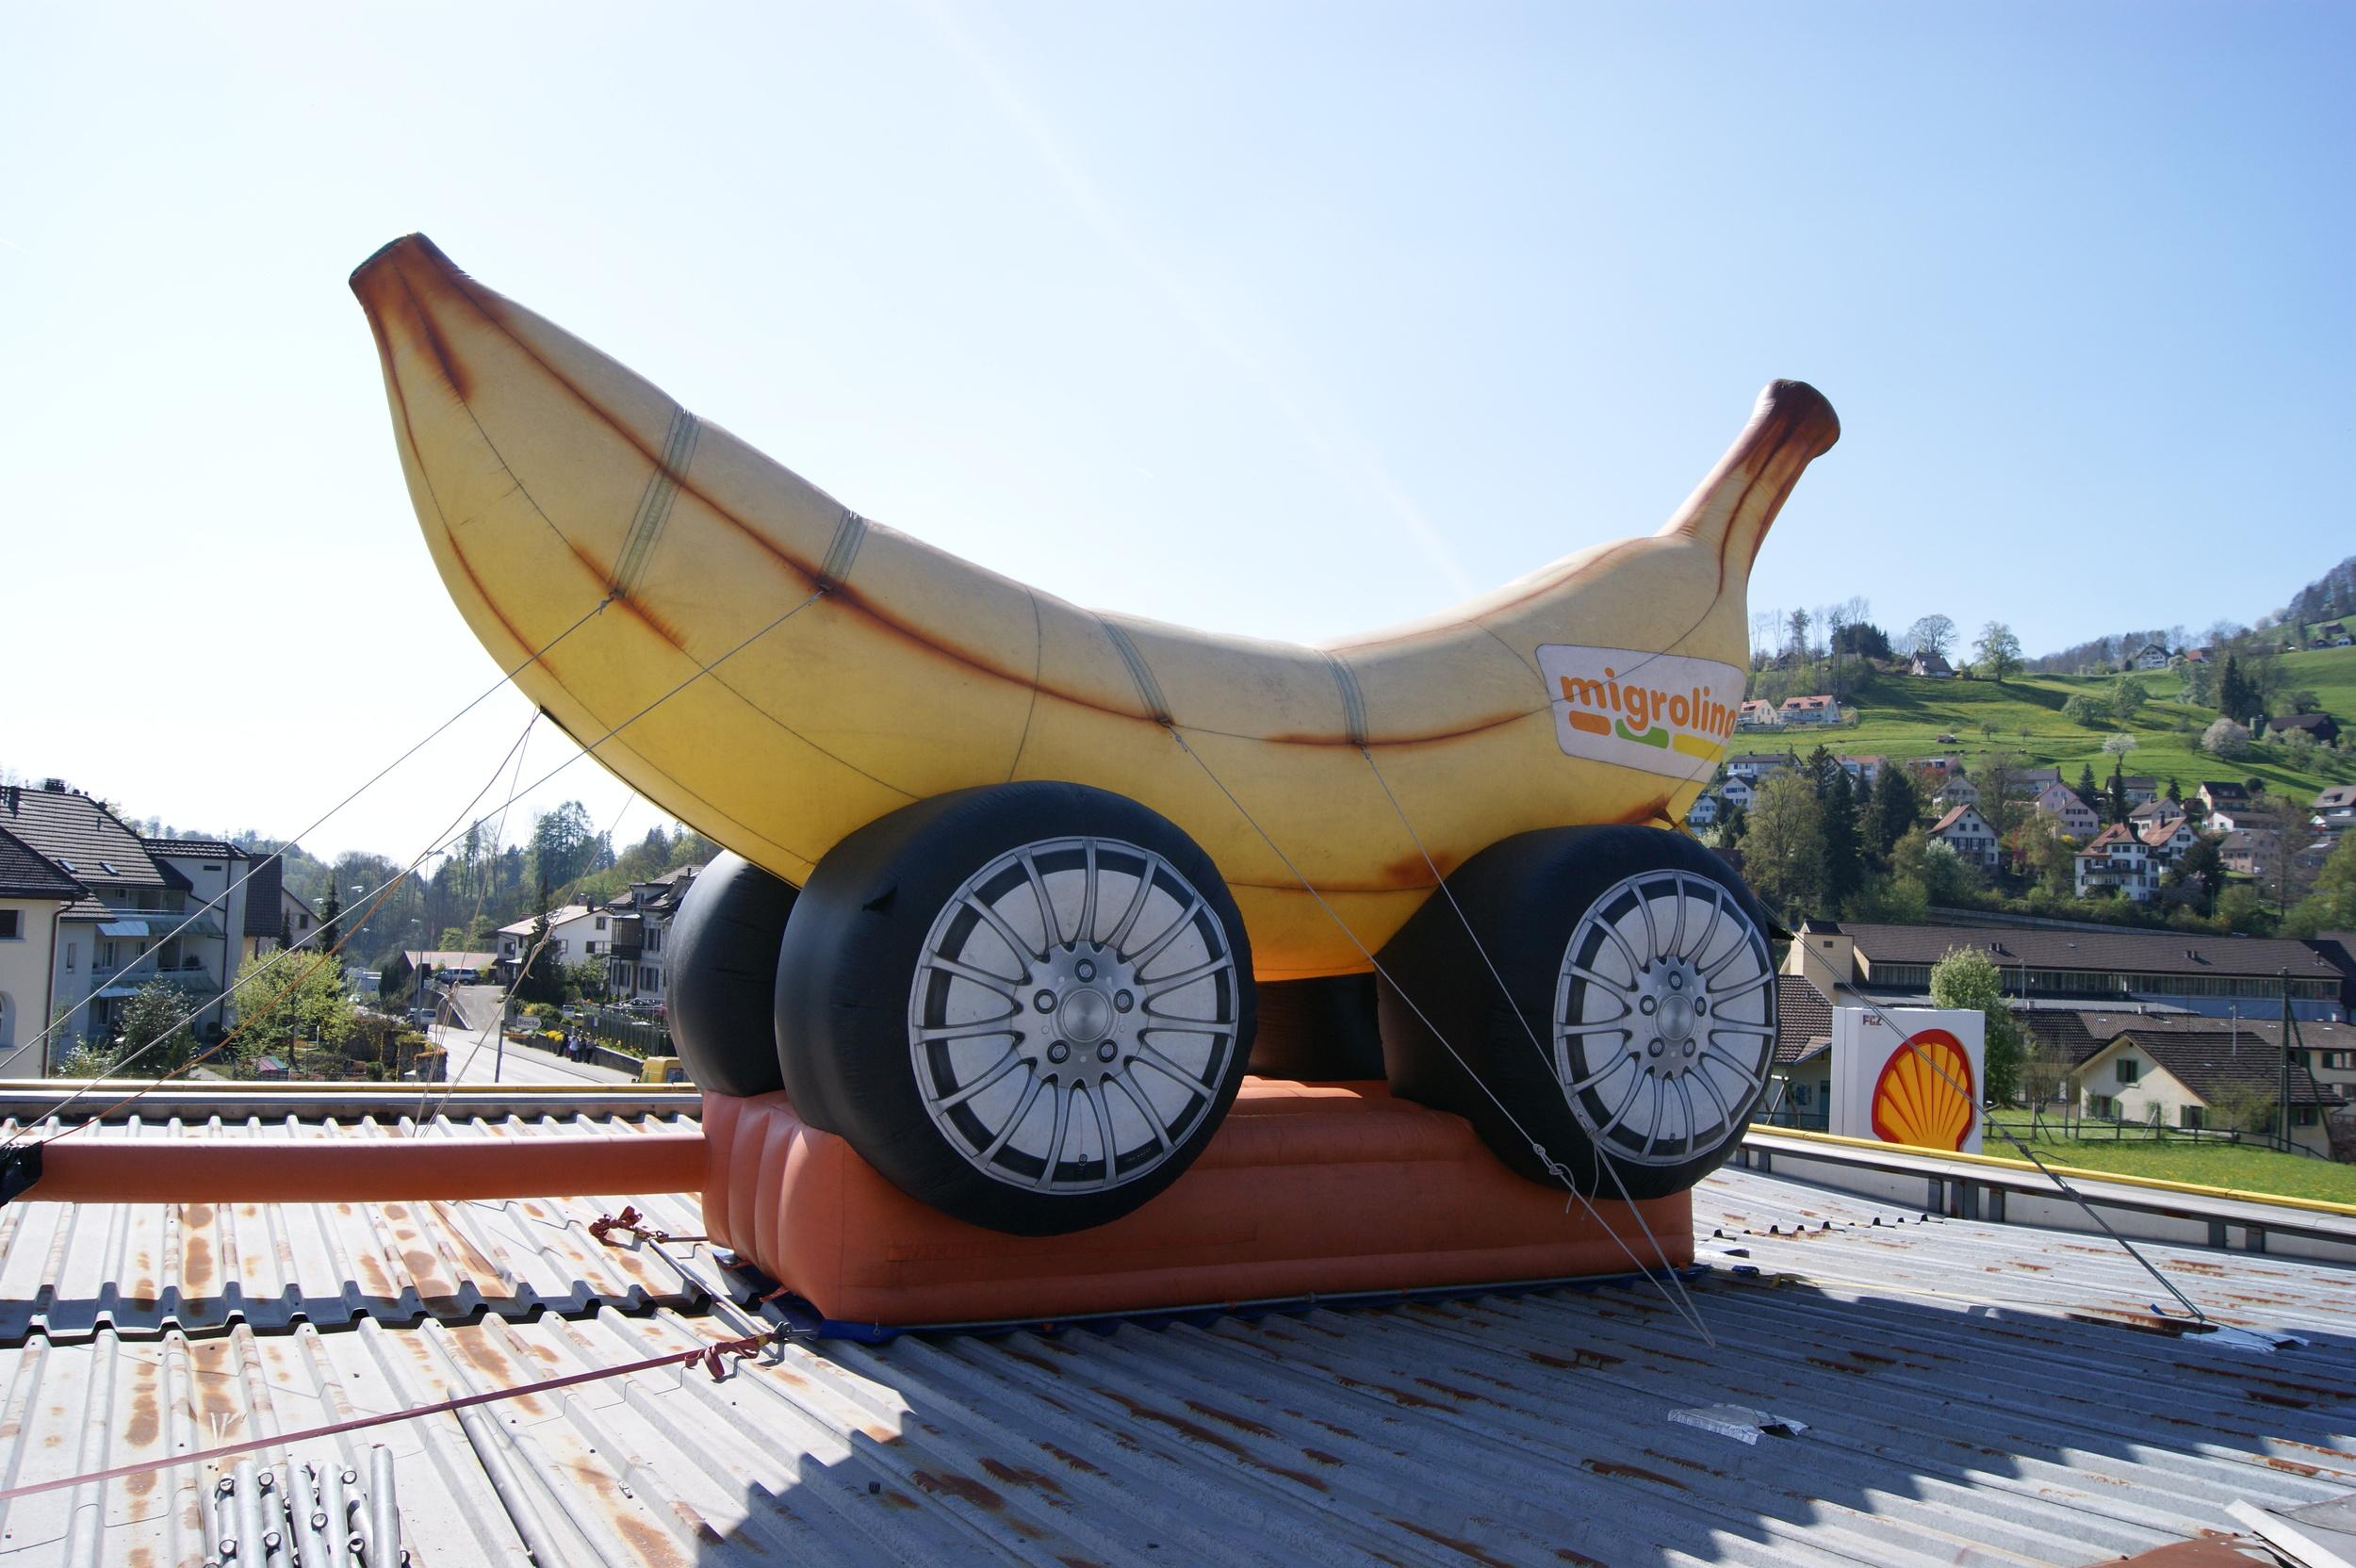 28.04.10 Migrolino Banane 02.JPG